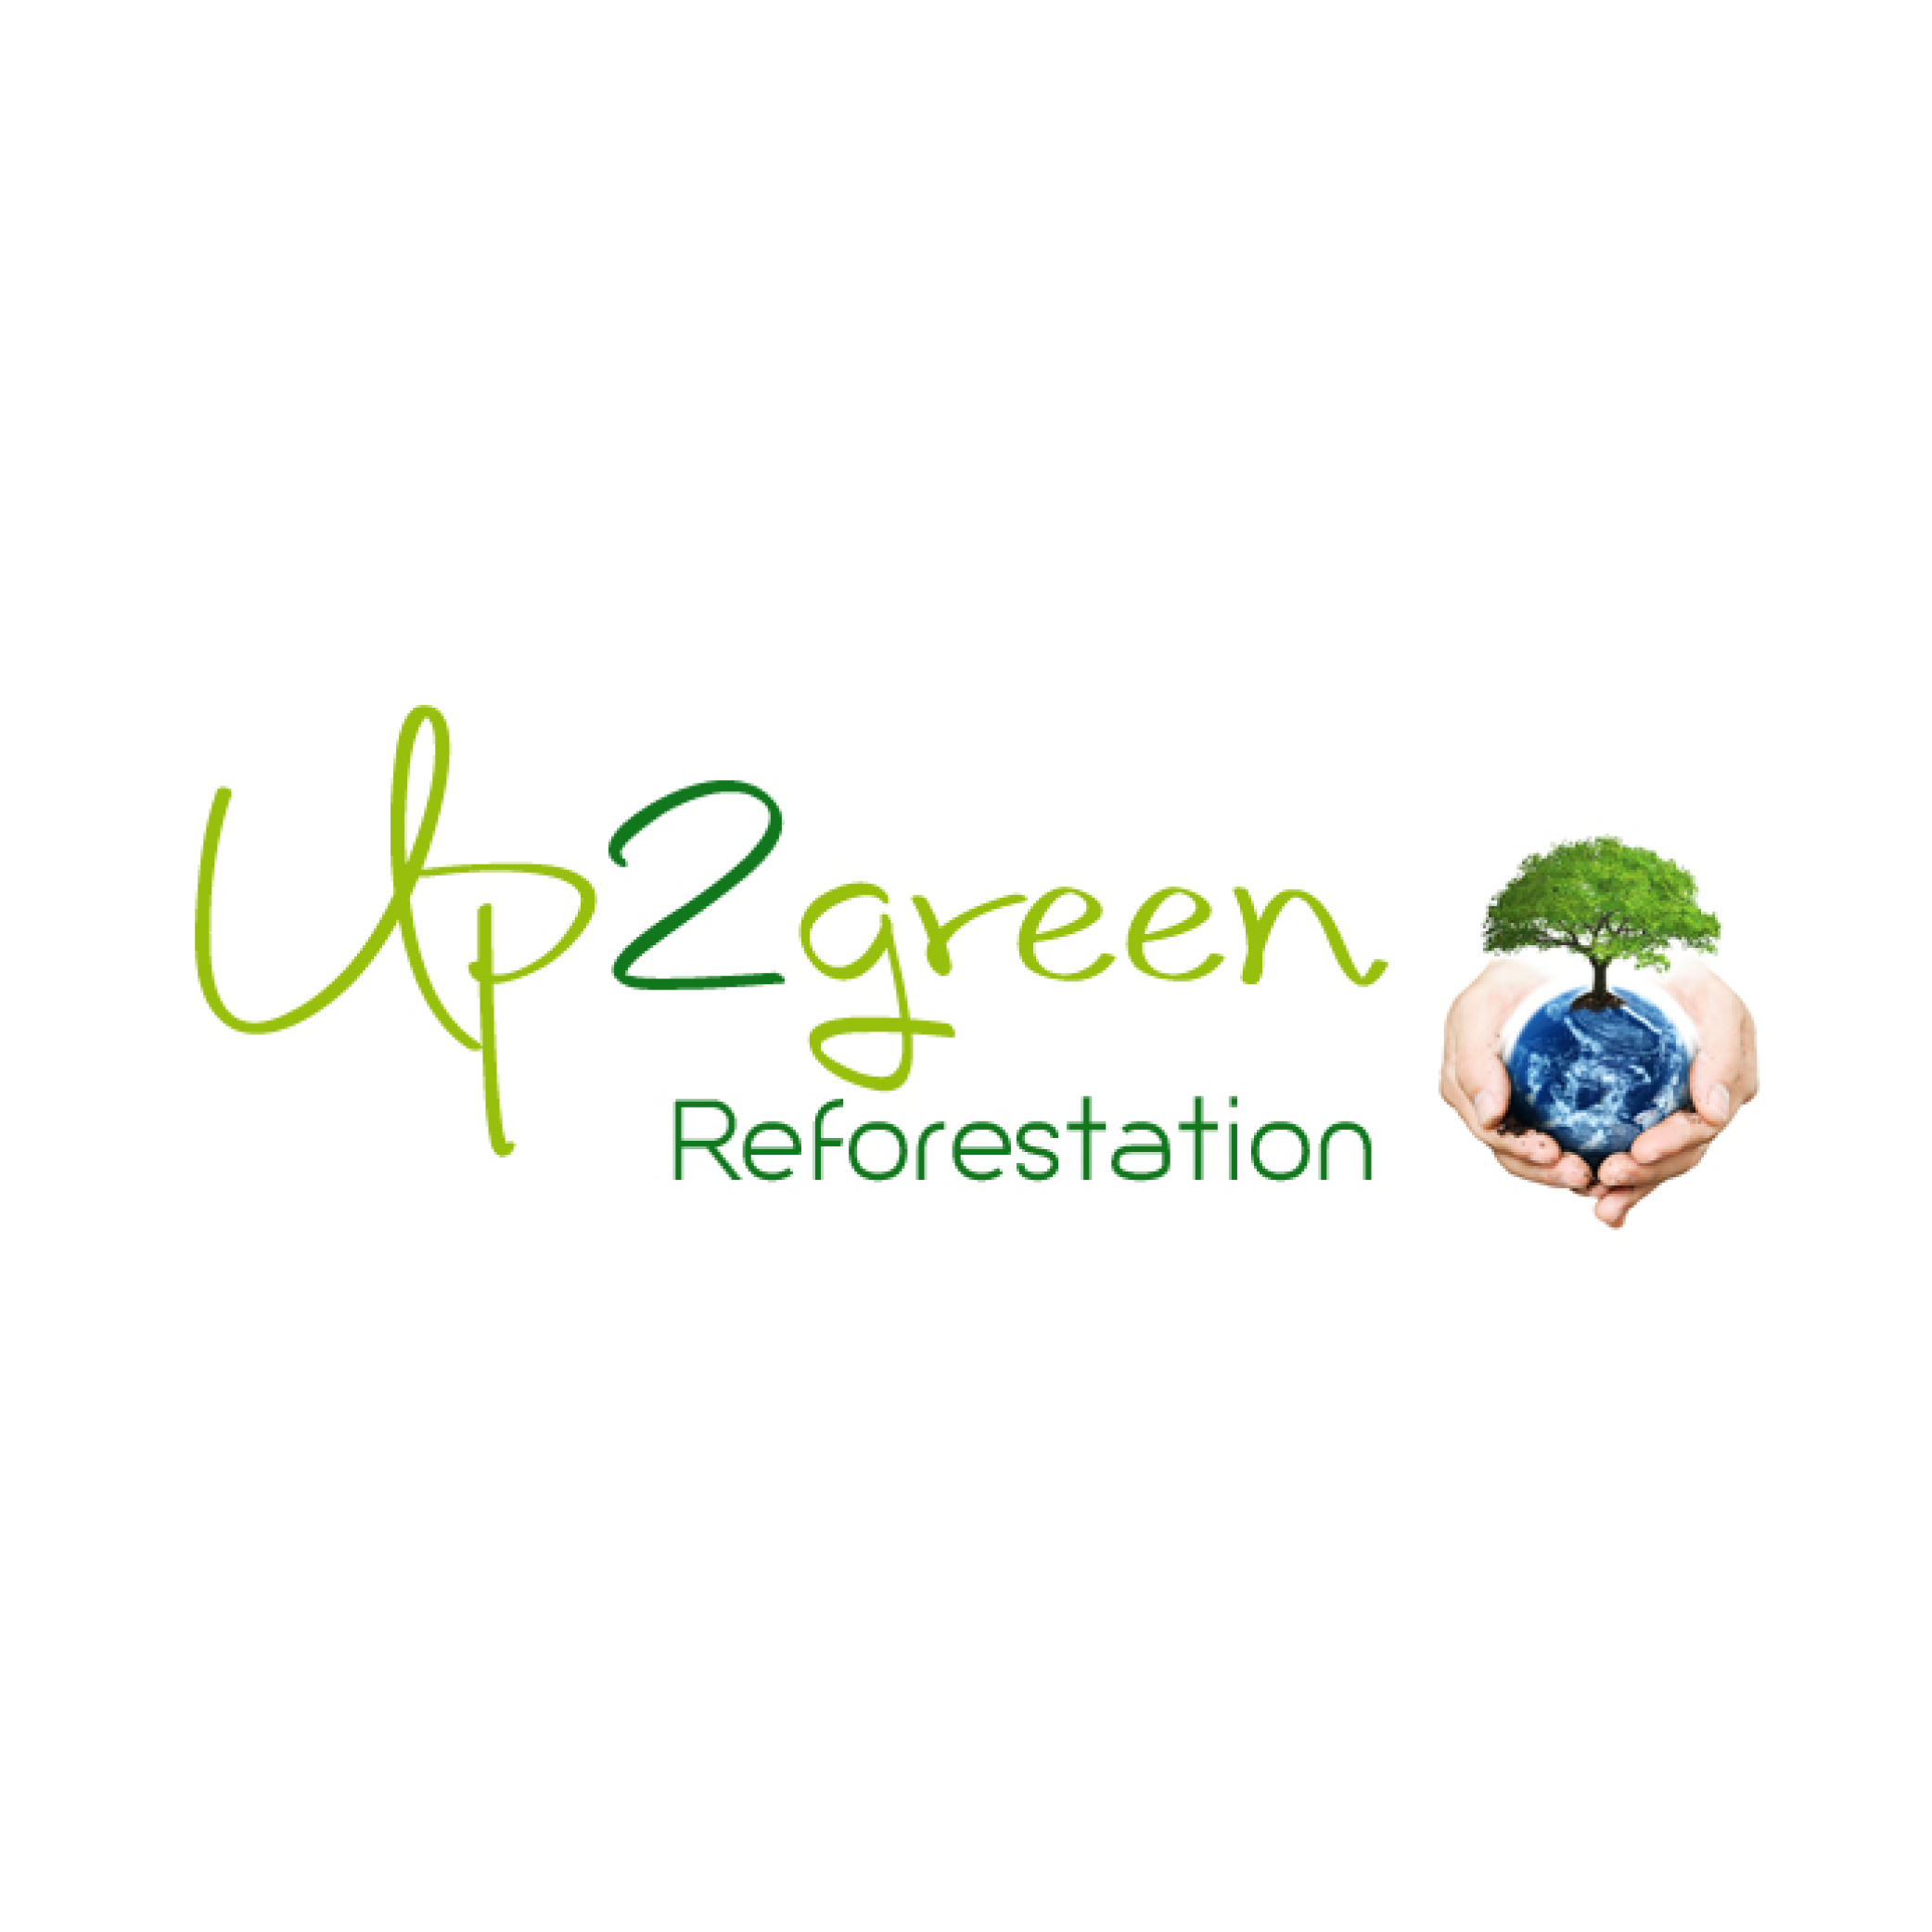 macaron_up2green_web.png